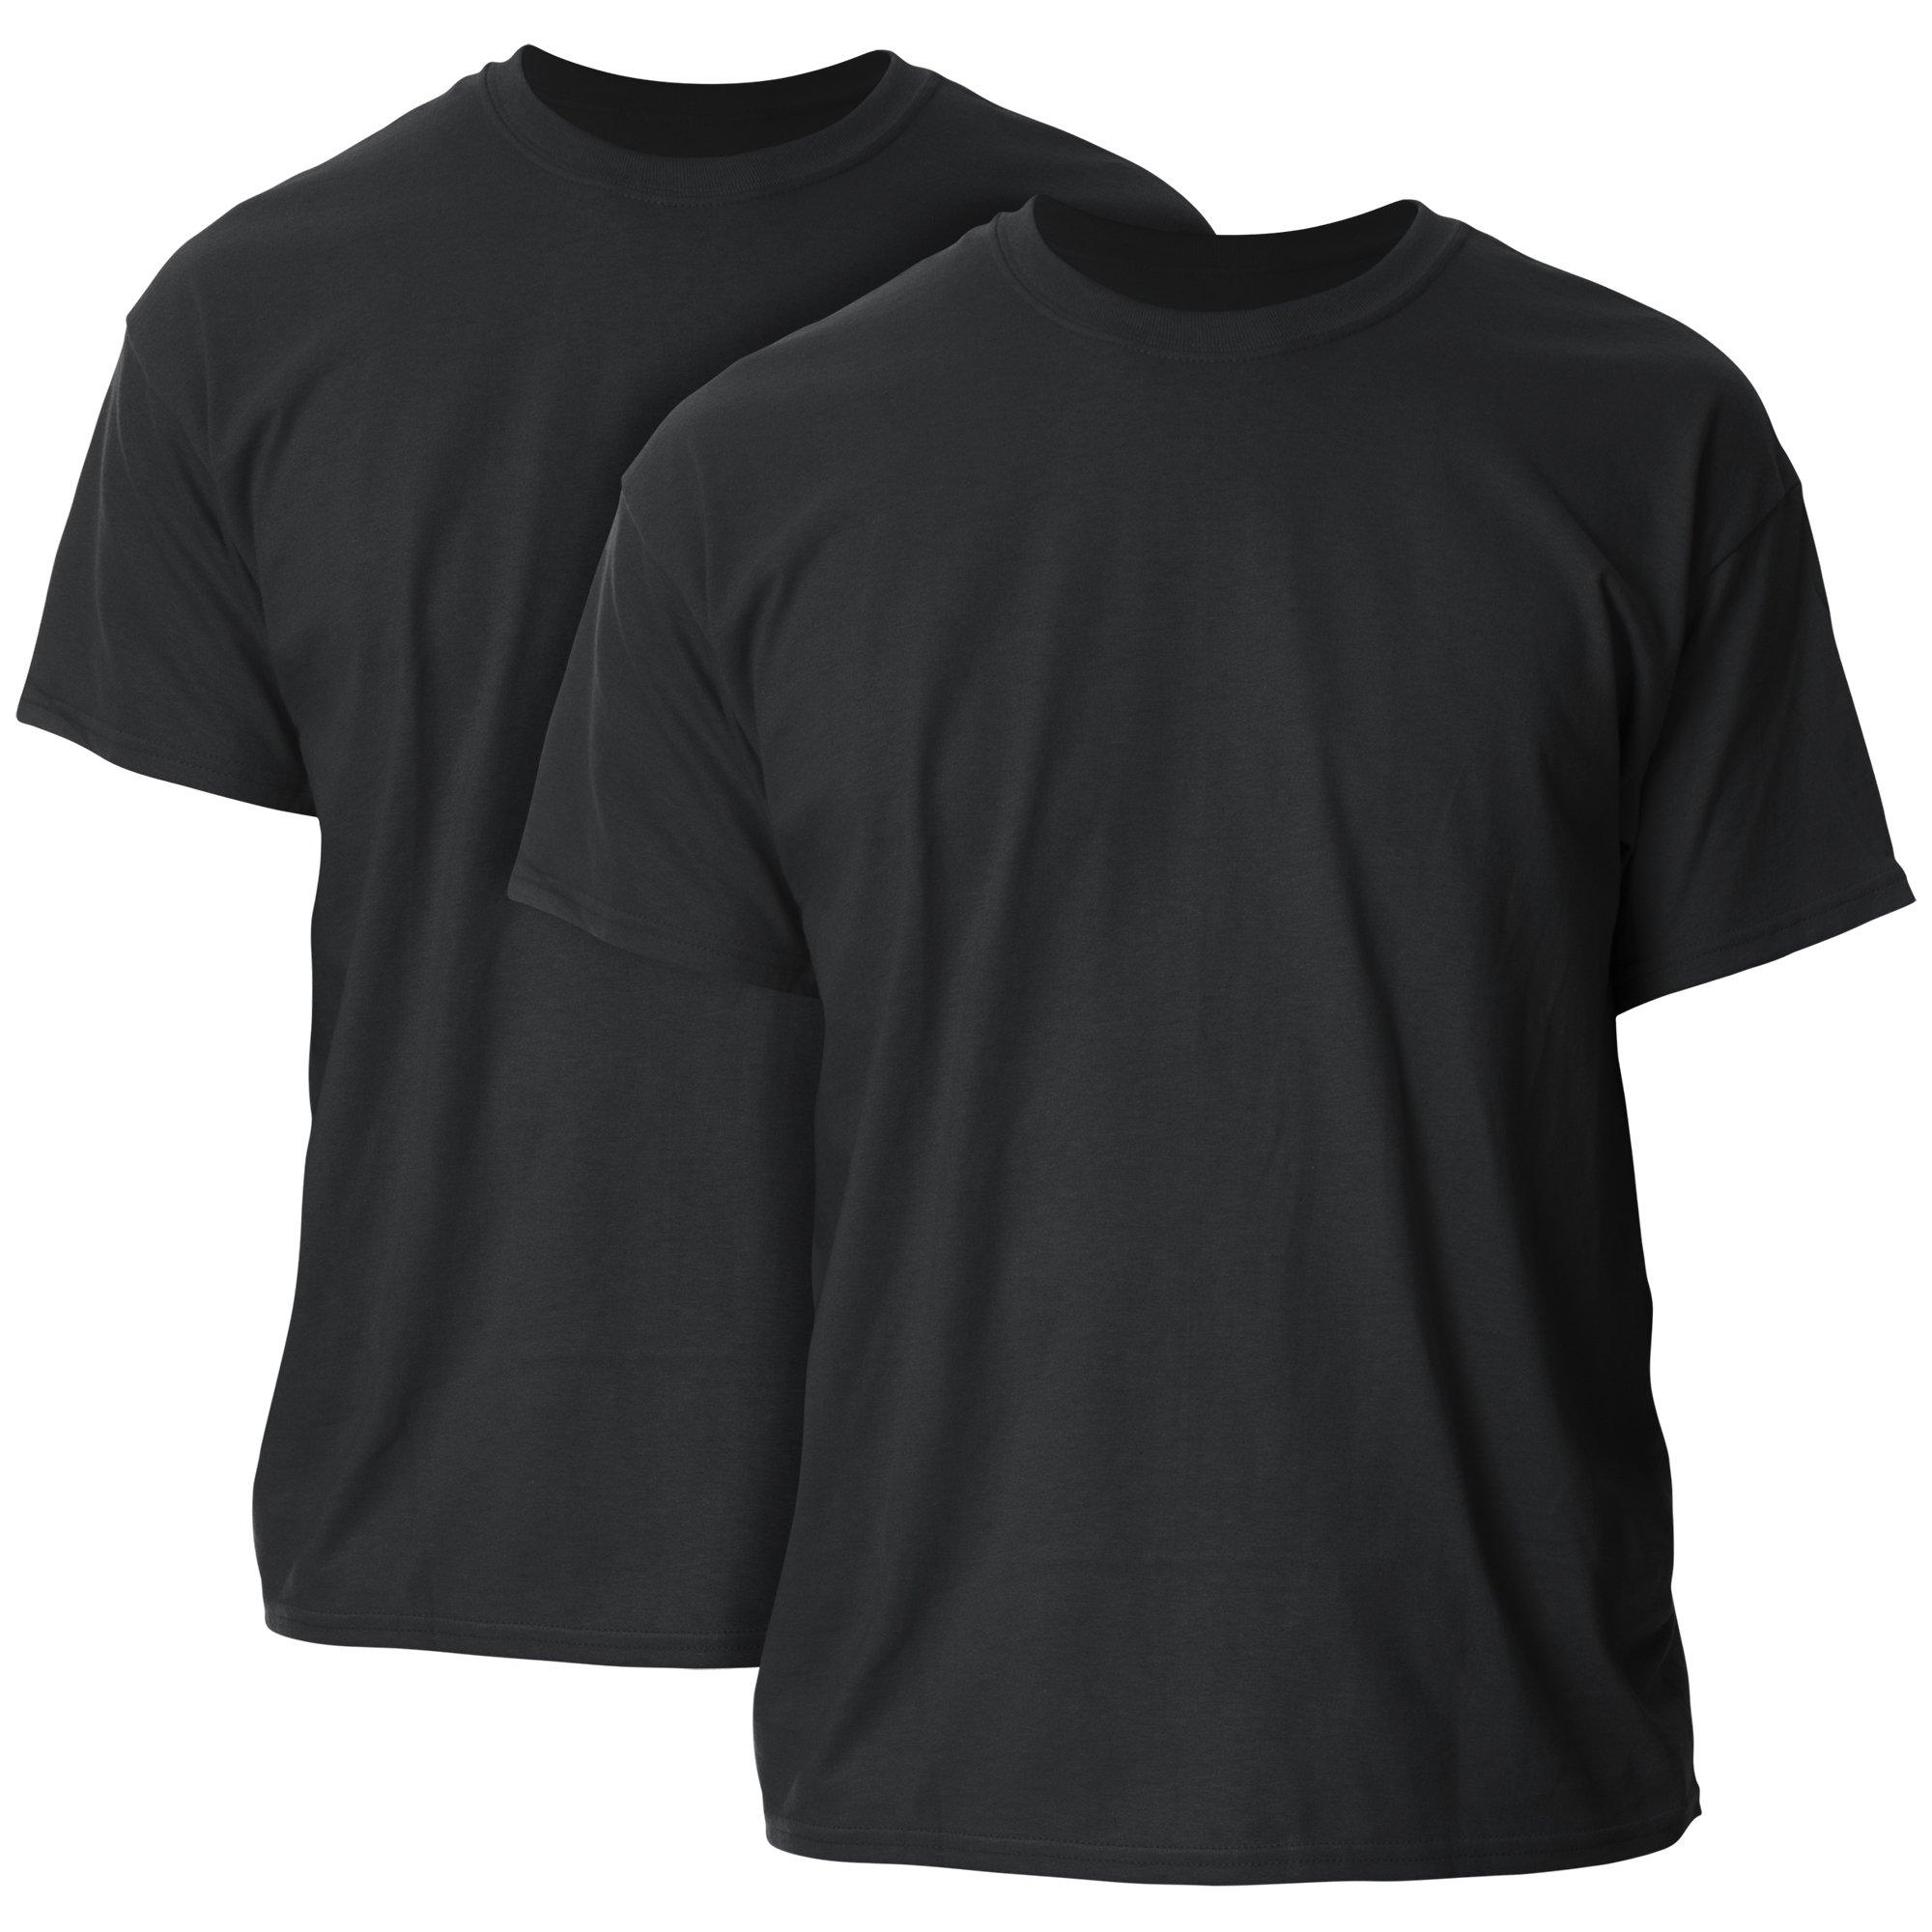 Gildan Men's Ultra Cotton Adult T-Shirt, 2-Pack, Black, 5X-Large